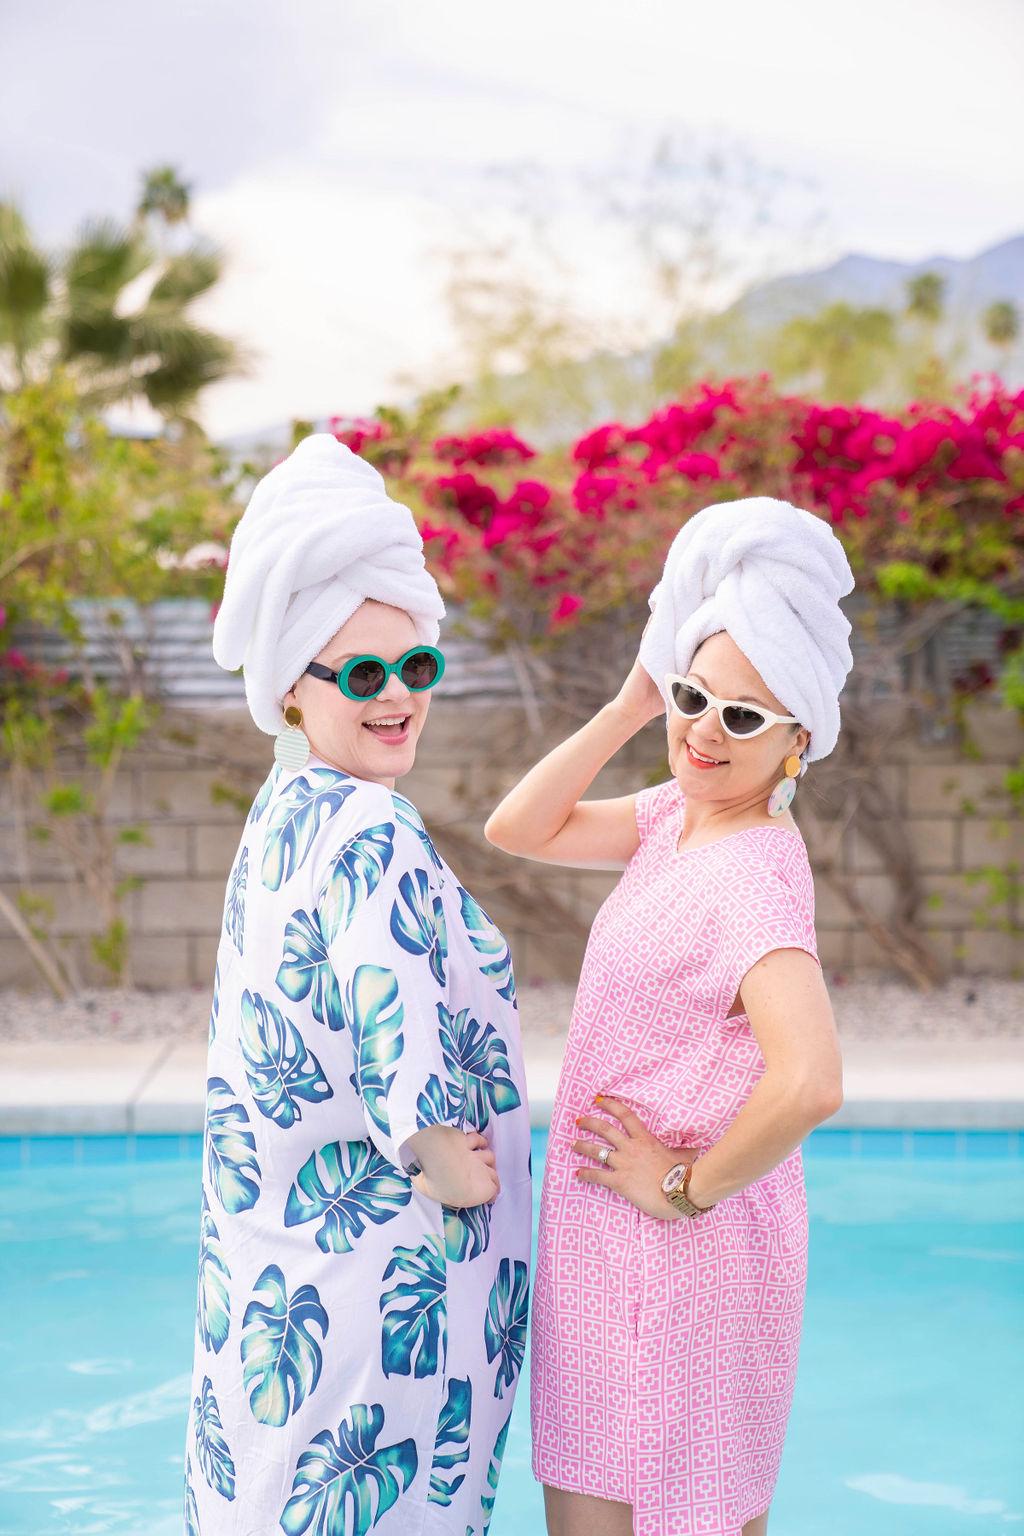 Charleston bloggers wearing chich Friedrich's Optik sunglasses